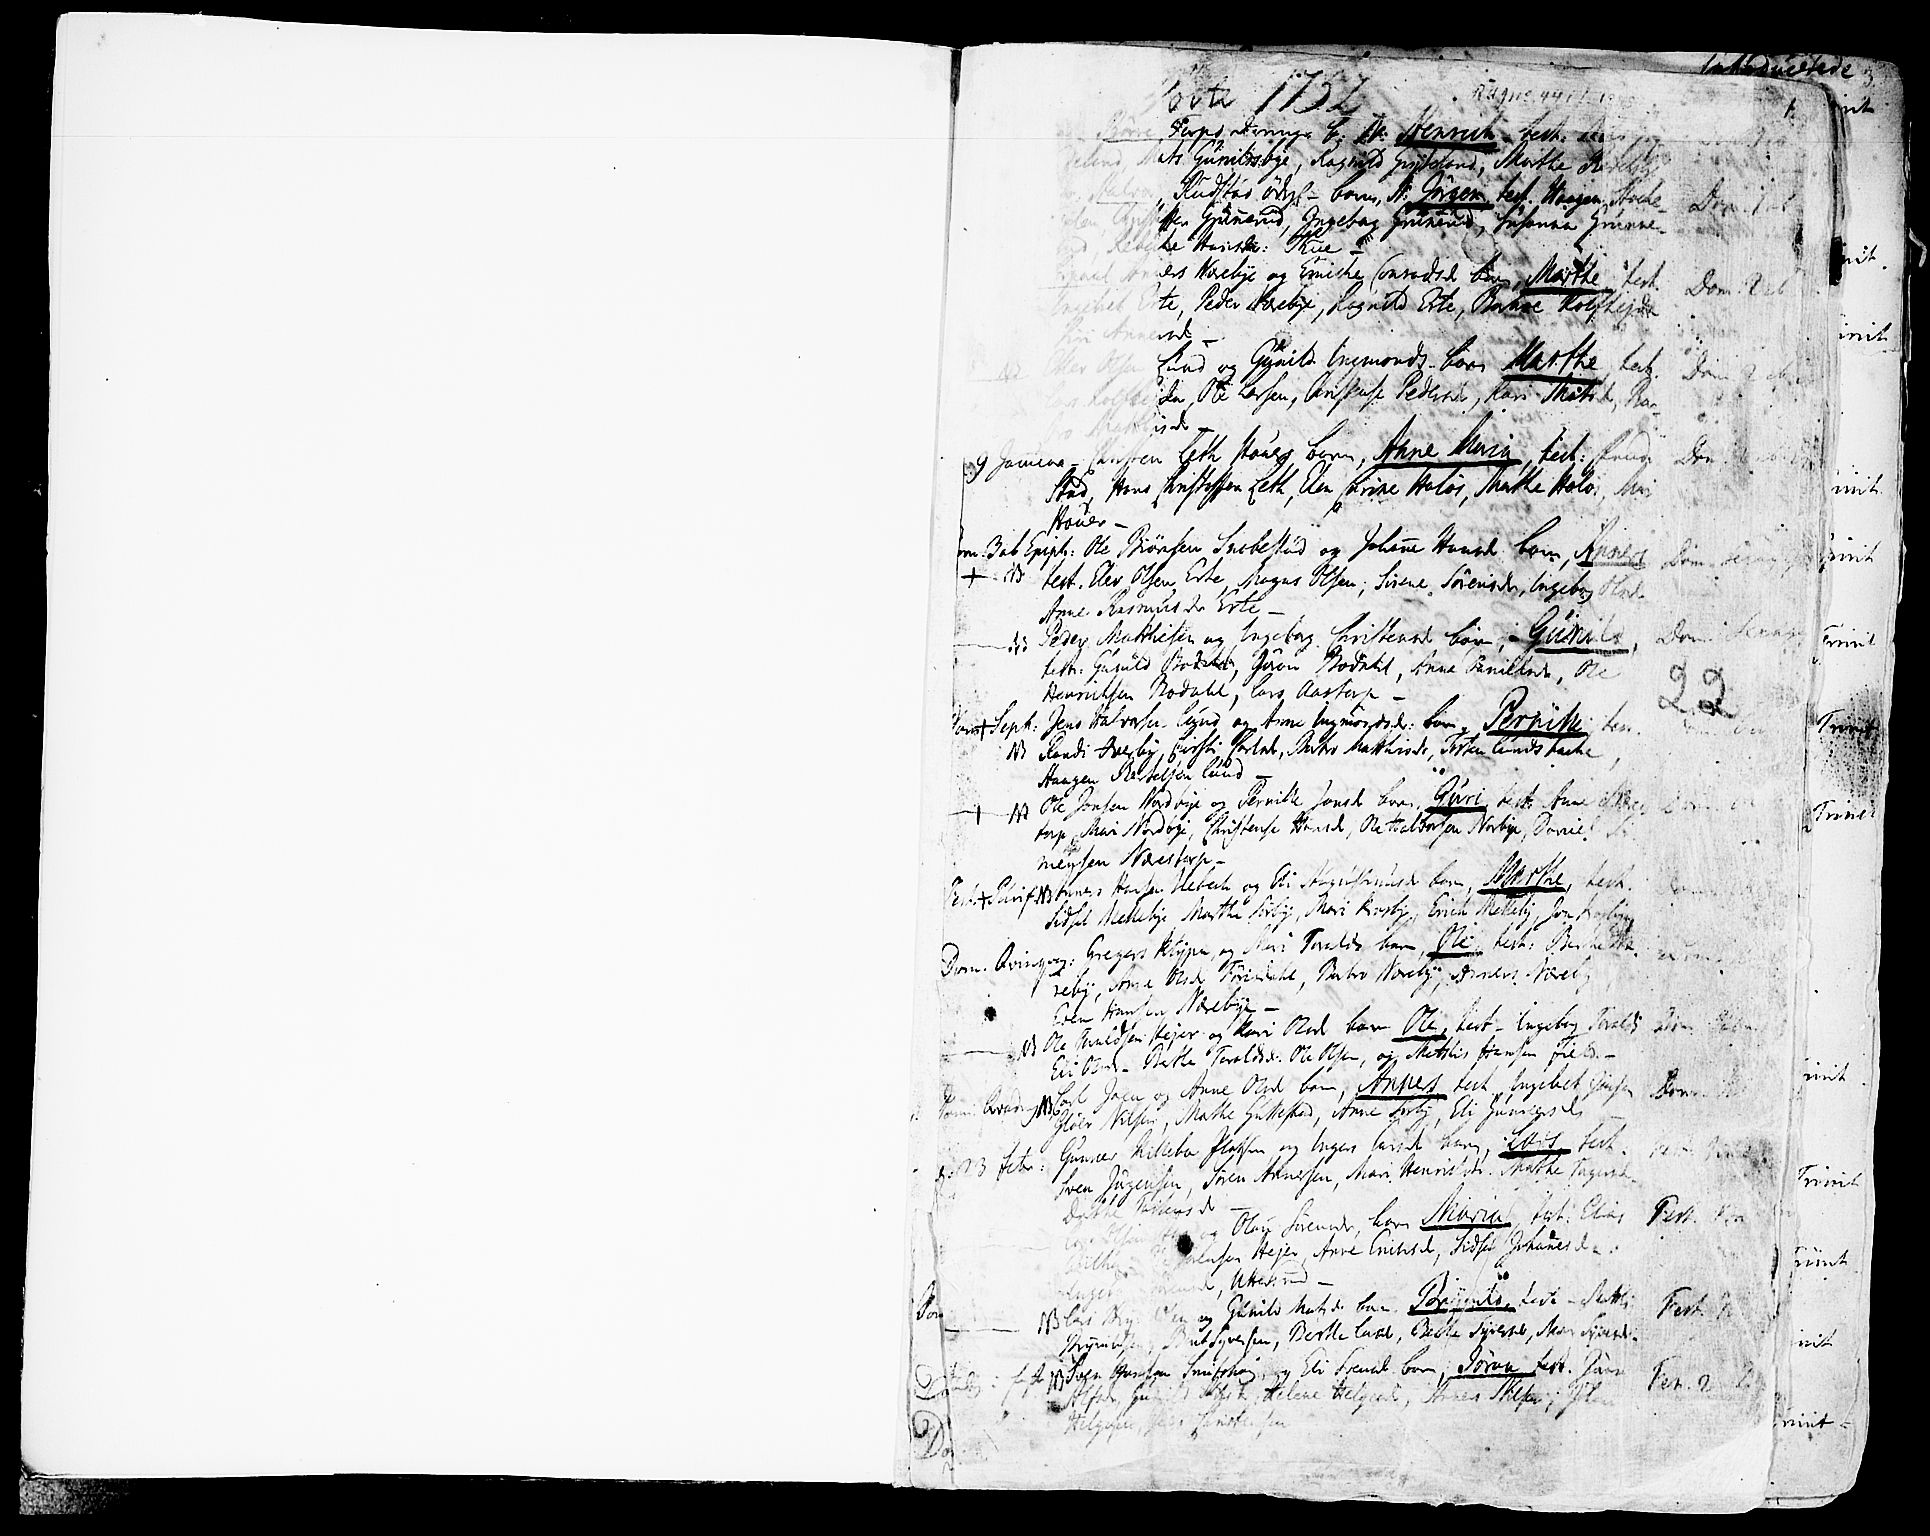 SAO, Rakkestad prestekontor Kirkebøker, F/Fa/L0003: Ministerialbok nr. I 3, 1752-1777, s. 1